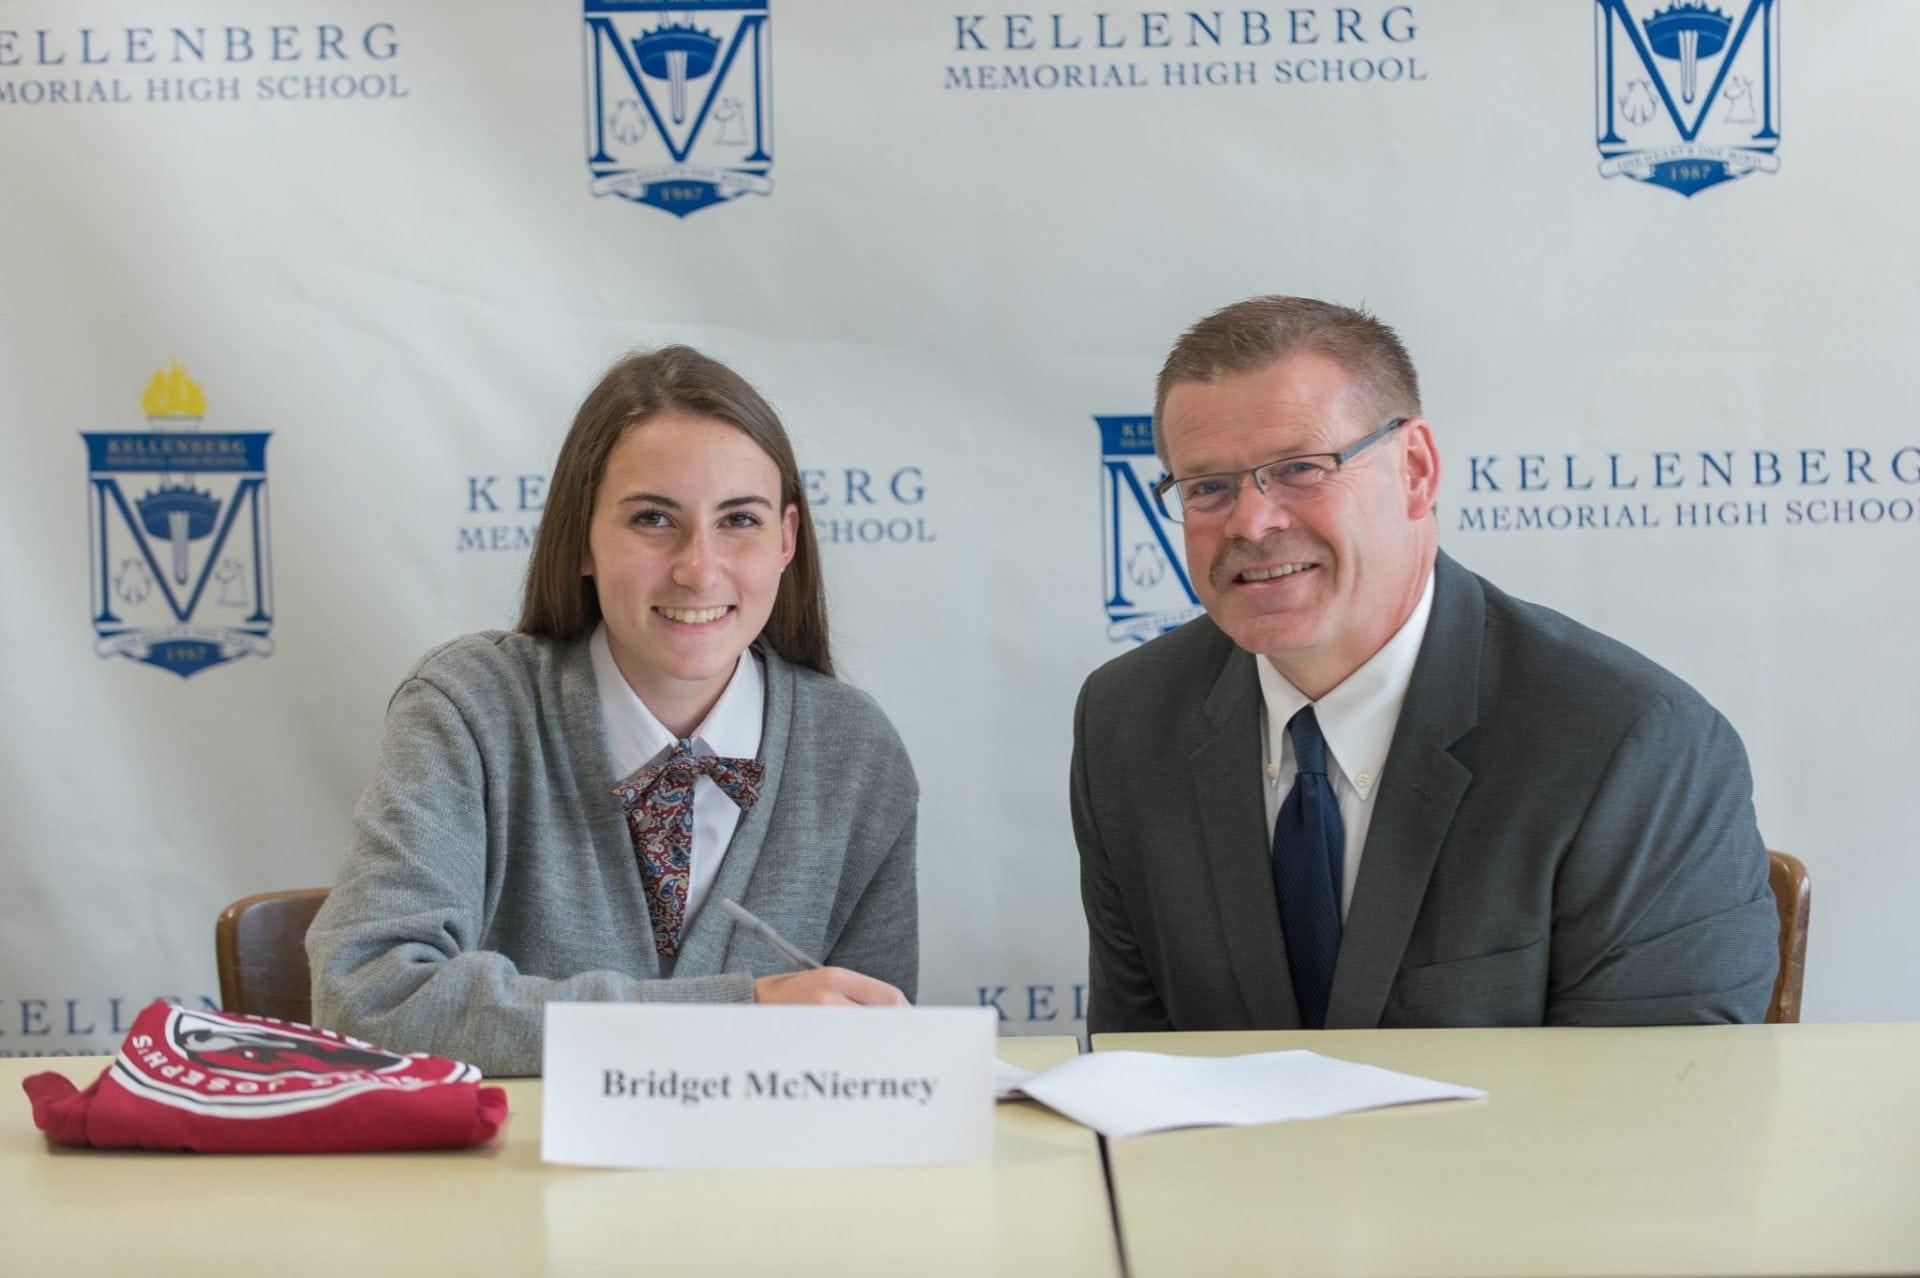 Bridget McNierney - St. Joseph's University - Womens Track and Field